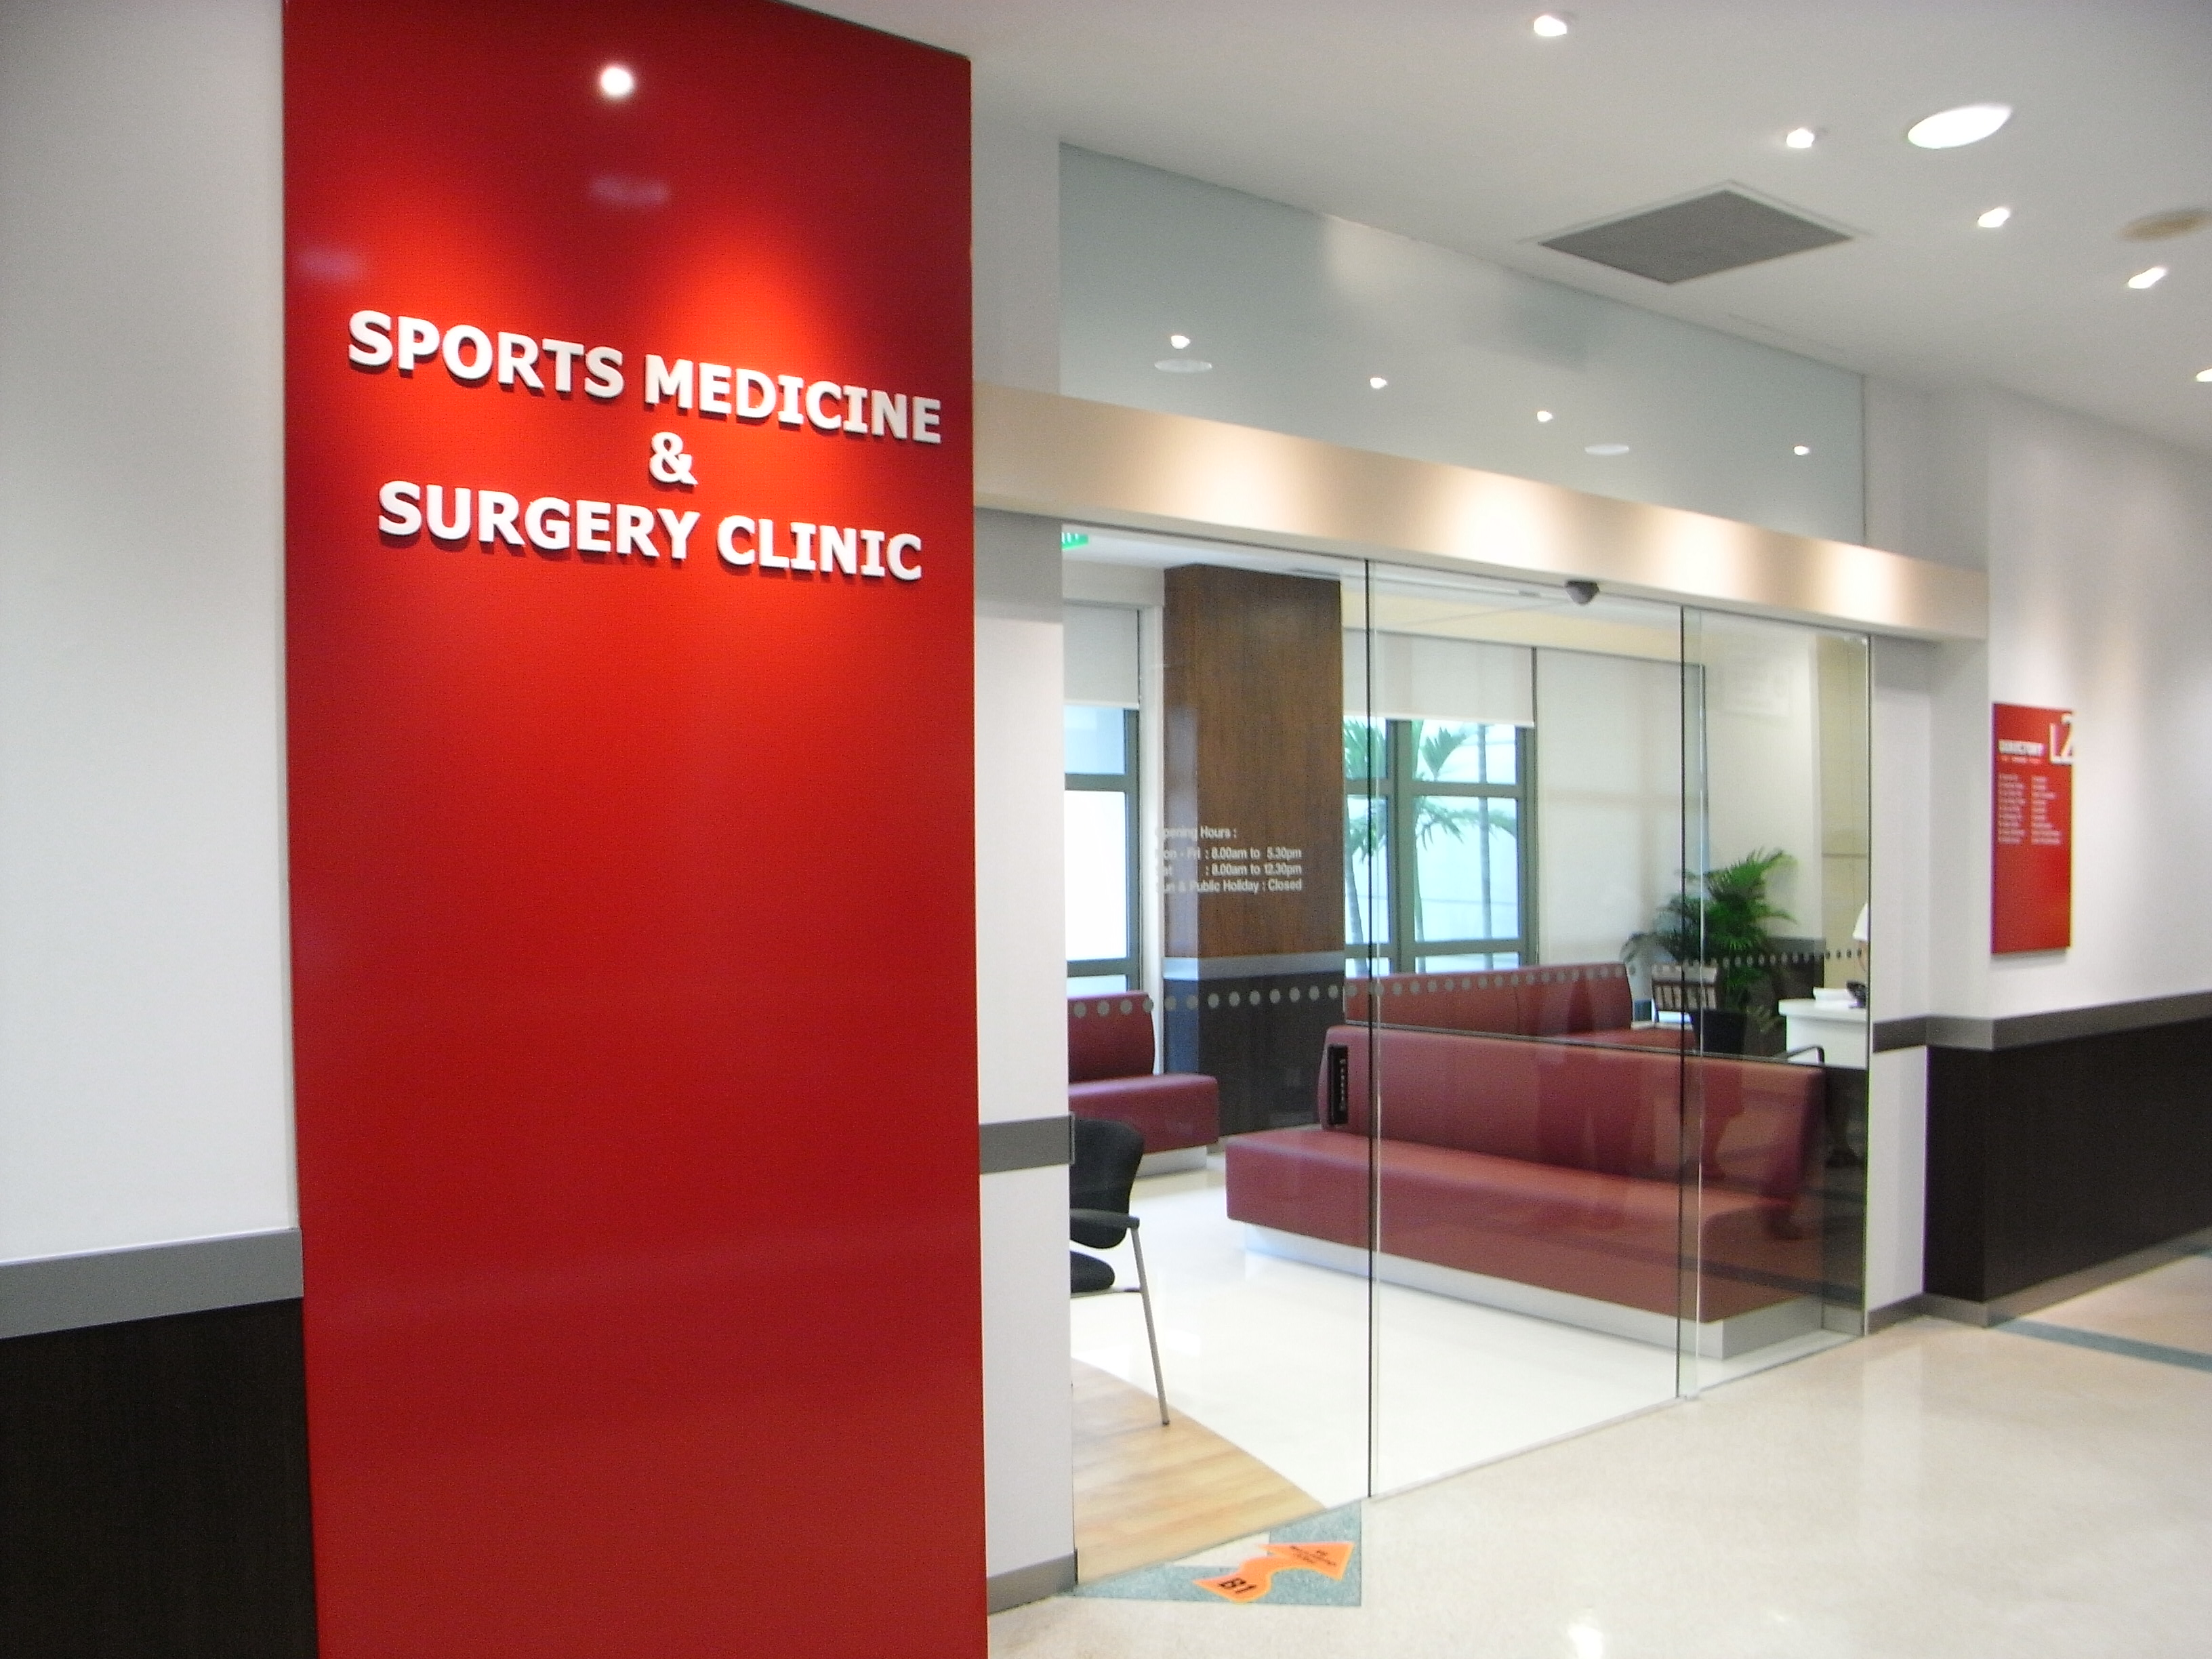 Sports Medicine & Surgery Clinic